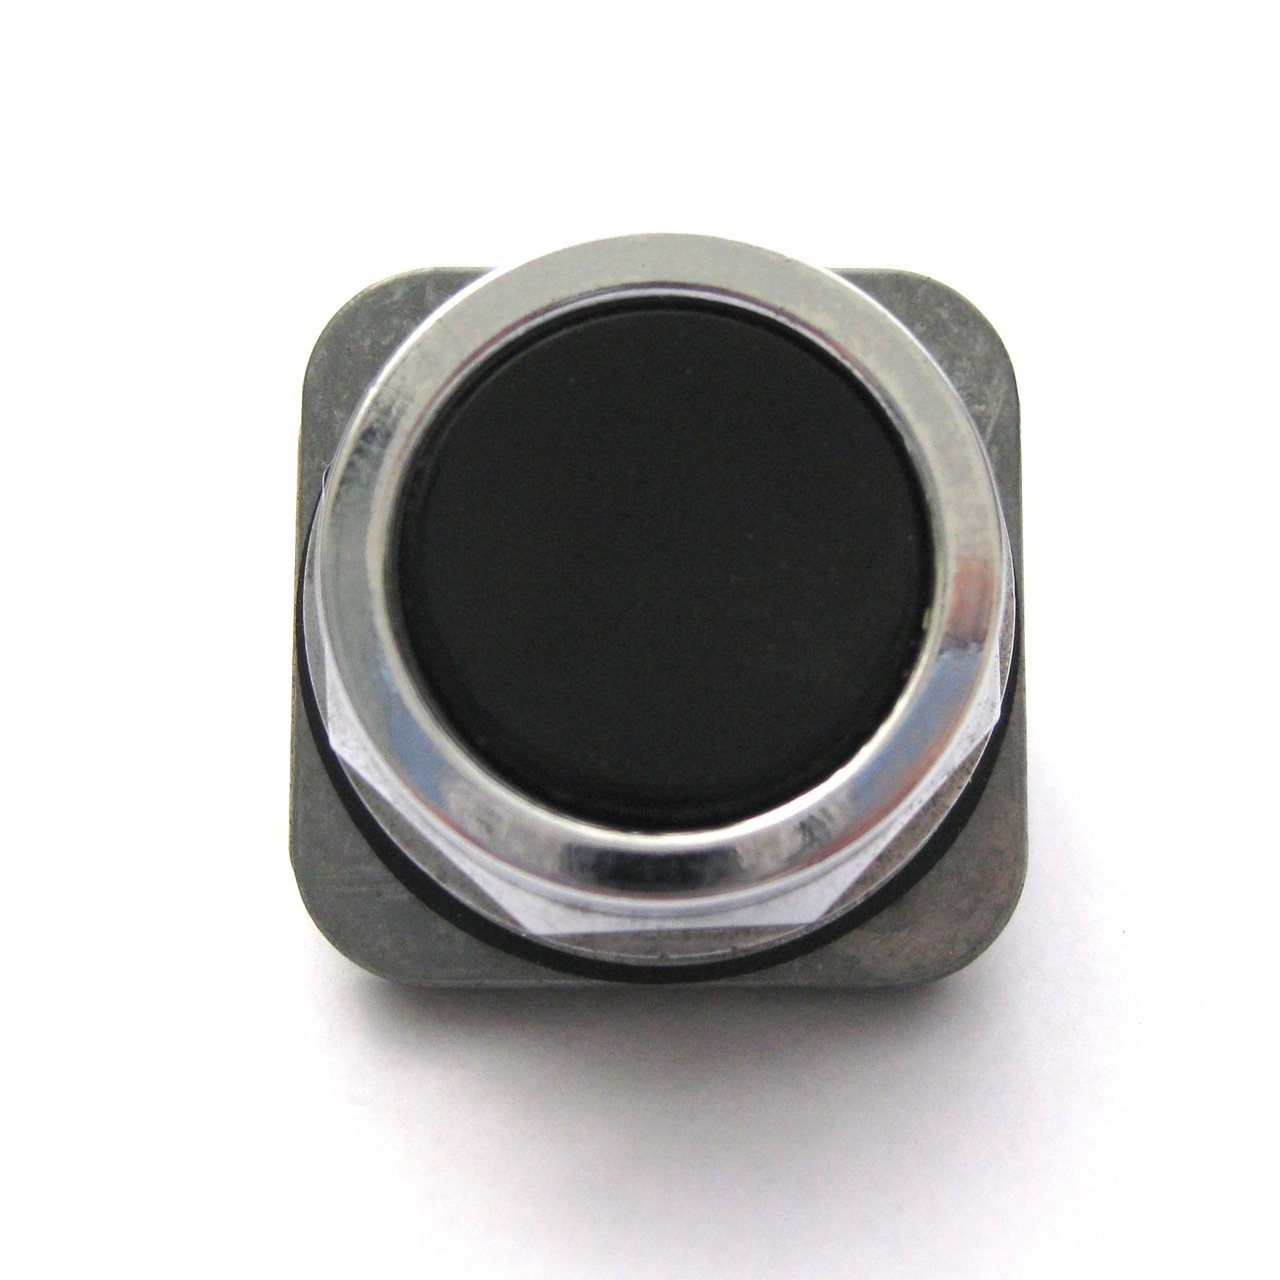 Furnas 52PA8A1 Button Switch